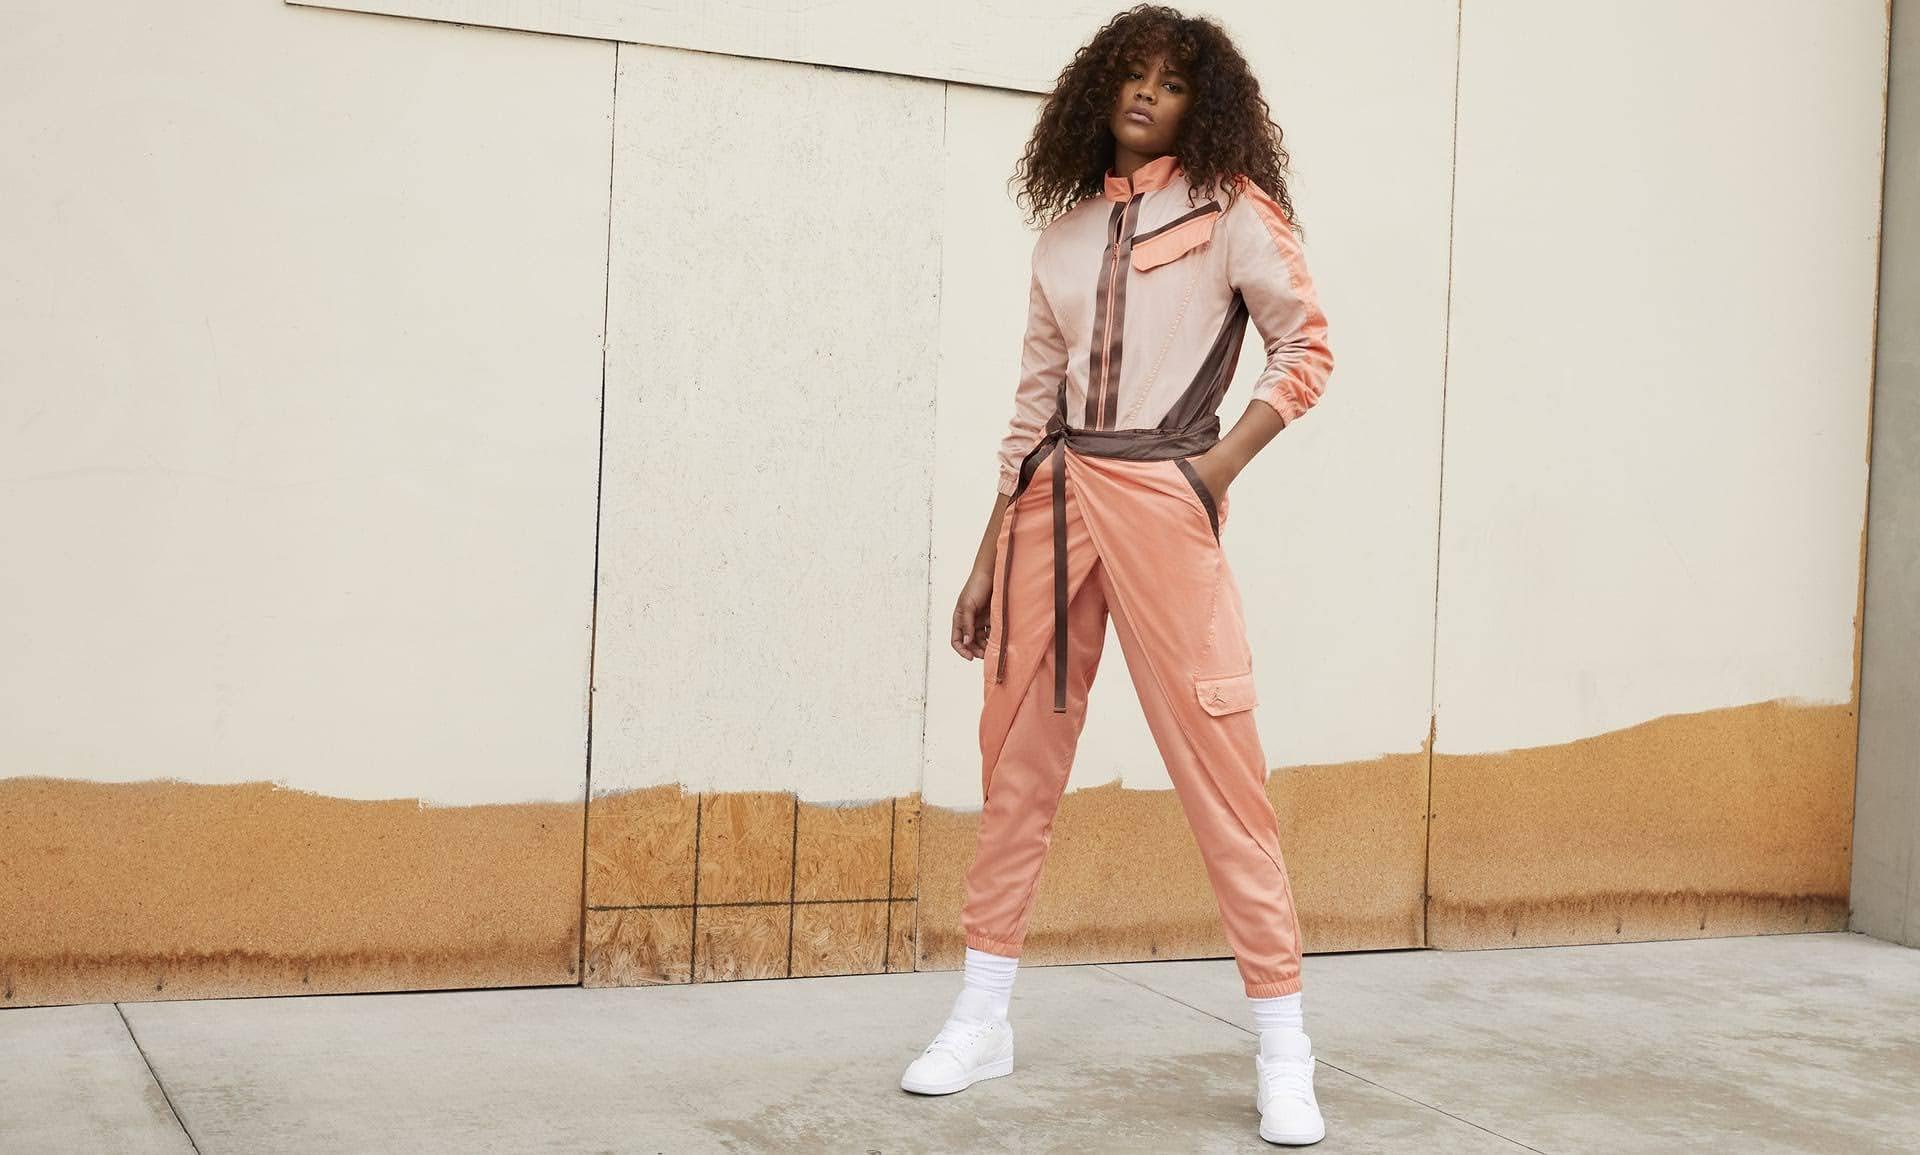 Nike-jordan-brand-ma-2-air-max-200-and-women-s-future-primal-apparel nike-jordan-future-primal-womens-flight-suit-DA1517-808-style-2